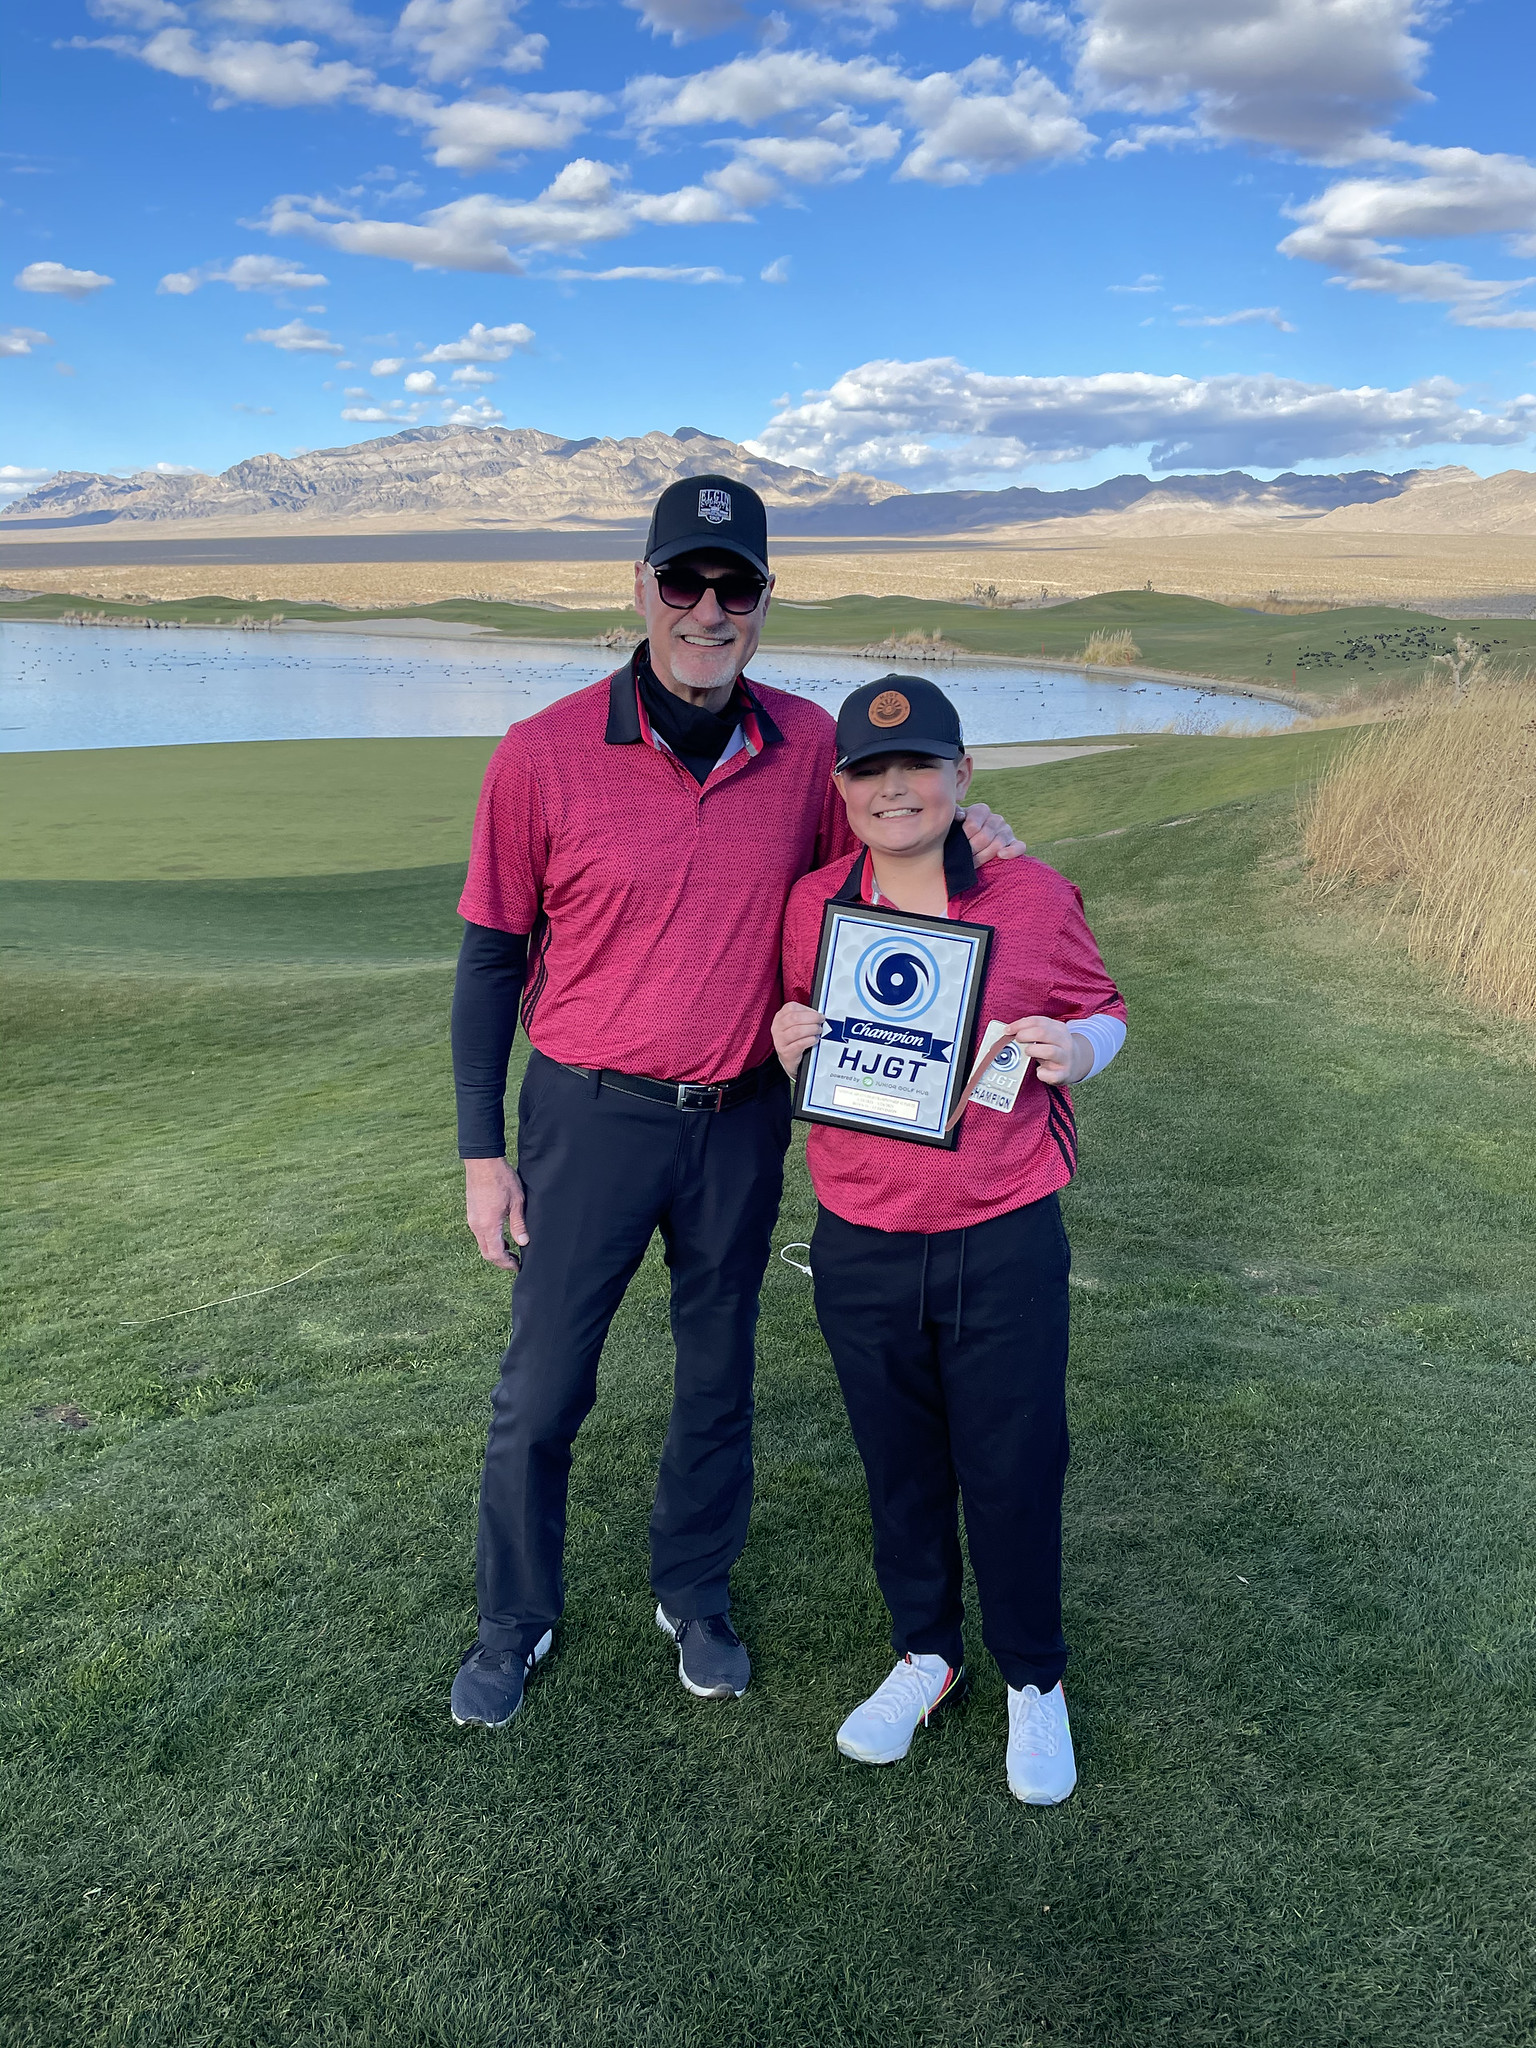 National Adult/Child Championship at Paiute